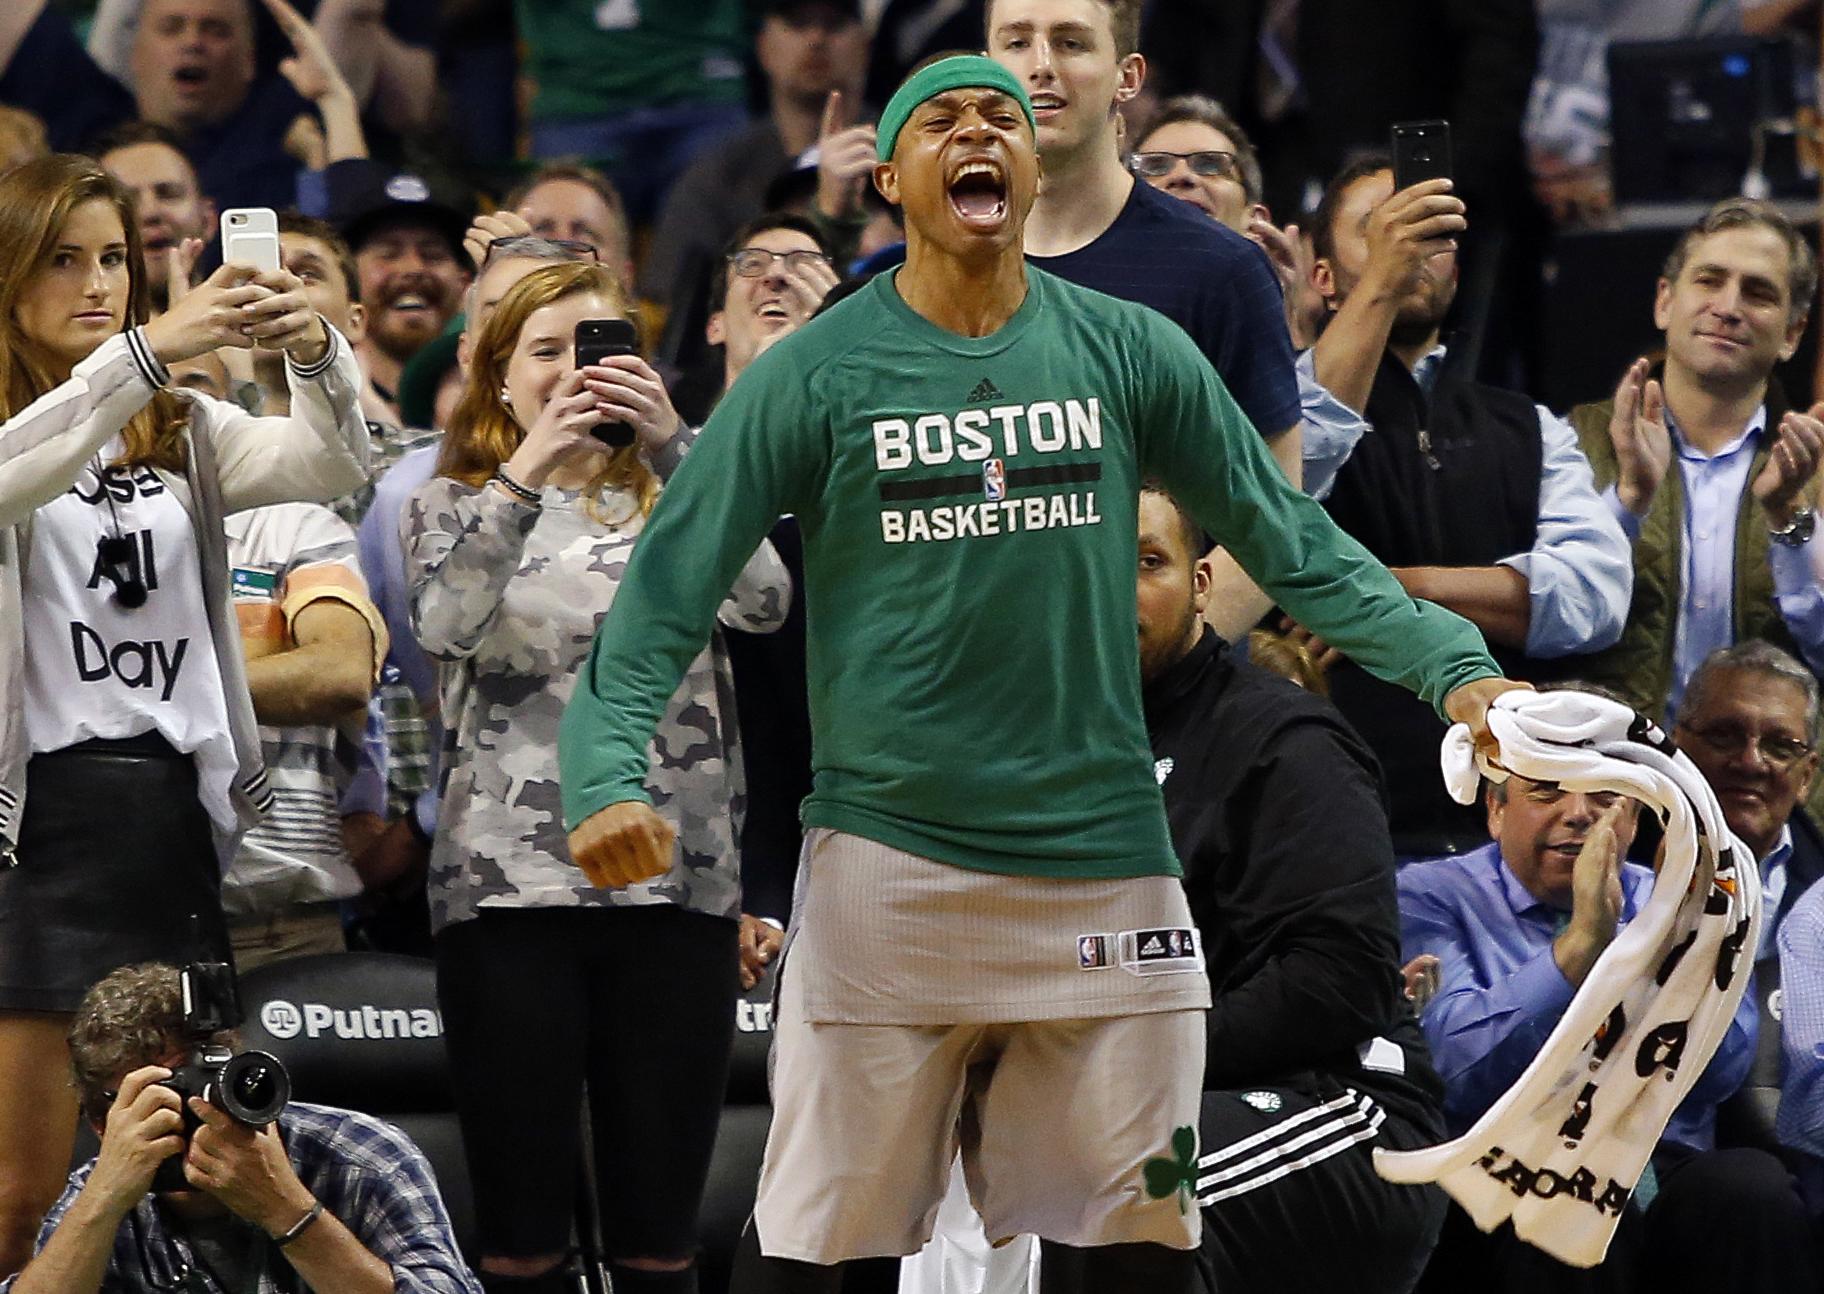 Boston Celtics guard Isaiah Thomas (4) celebrates in the final moments of the Boston Celtics 112-94 win over the Milwaukee Bucks at TD Garden.